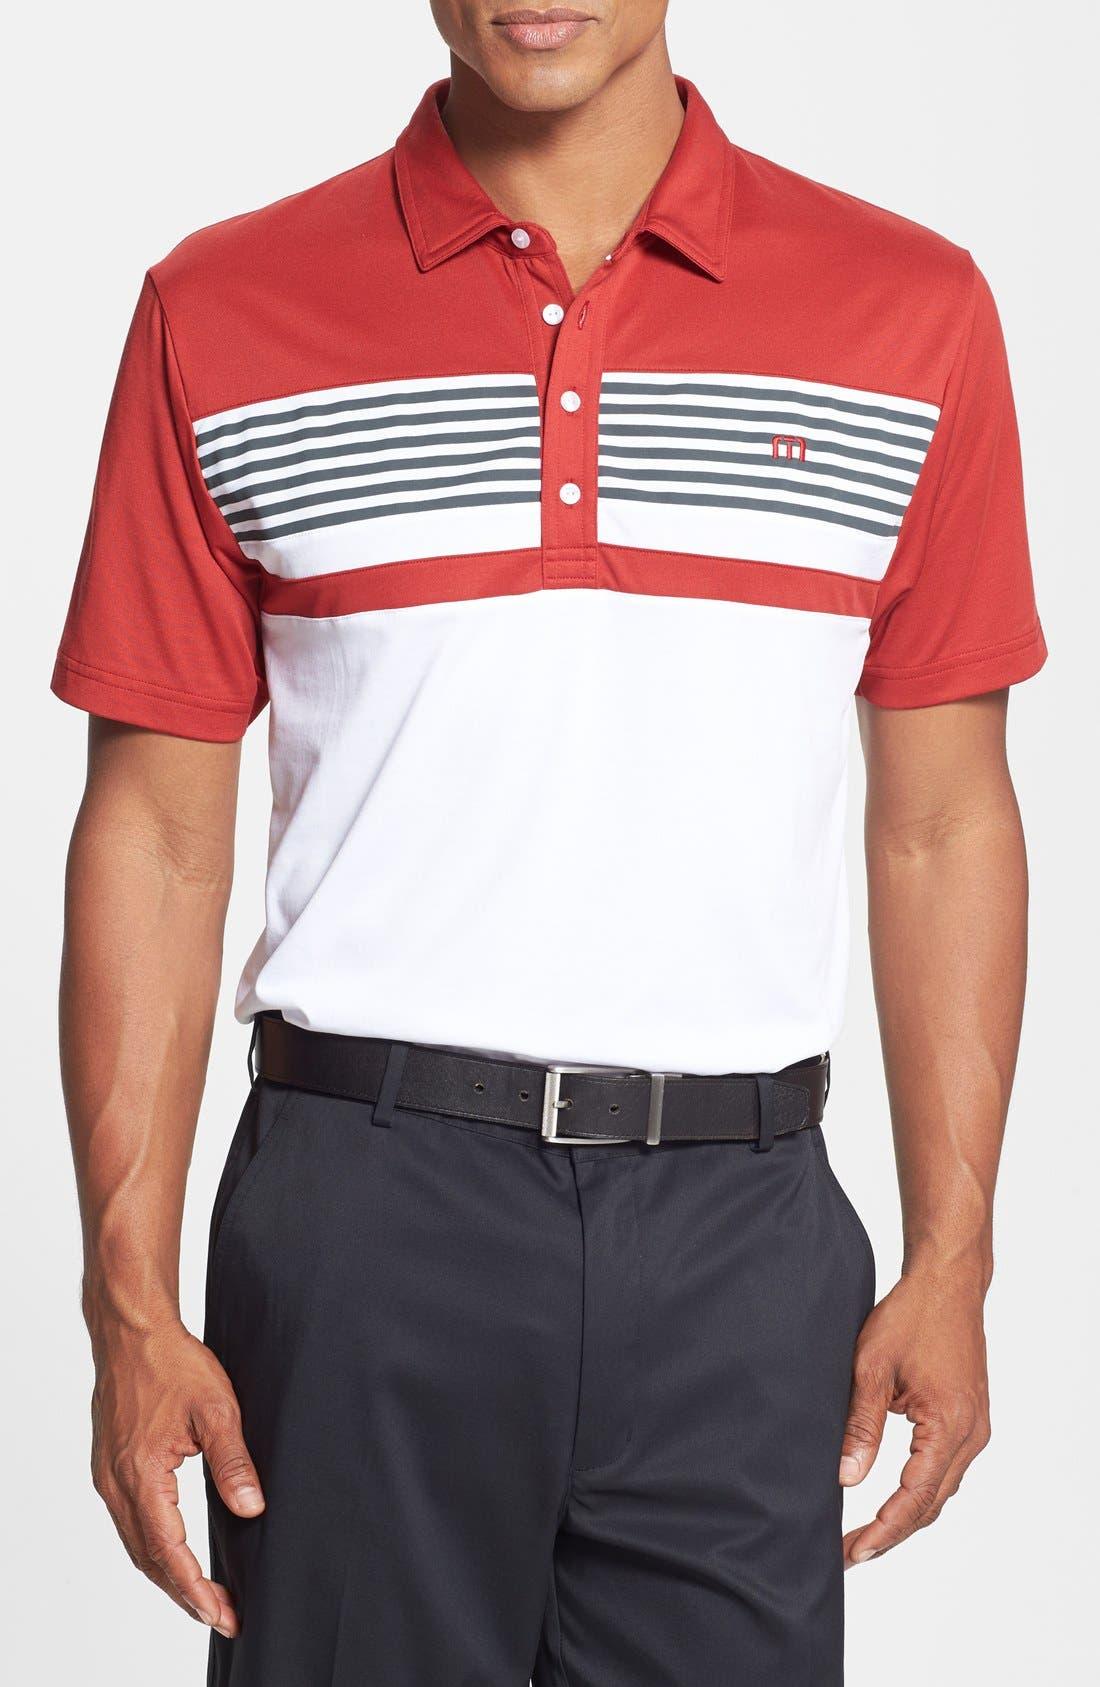 Main Image - Travis Mathew 'Kurkova' Trim Fit Performance Golf Polo